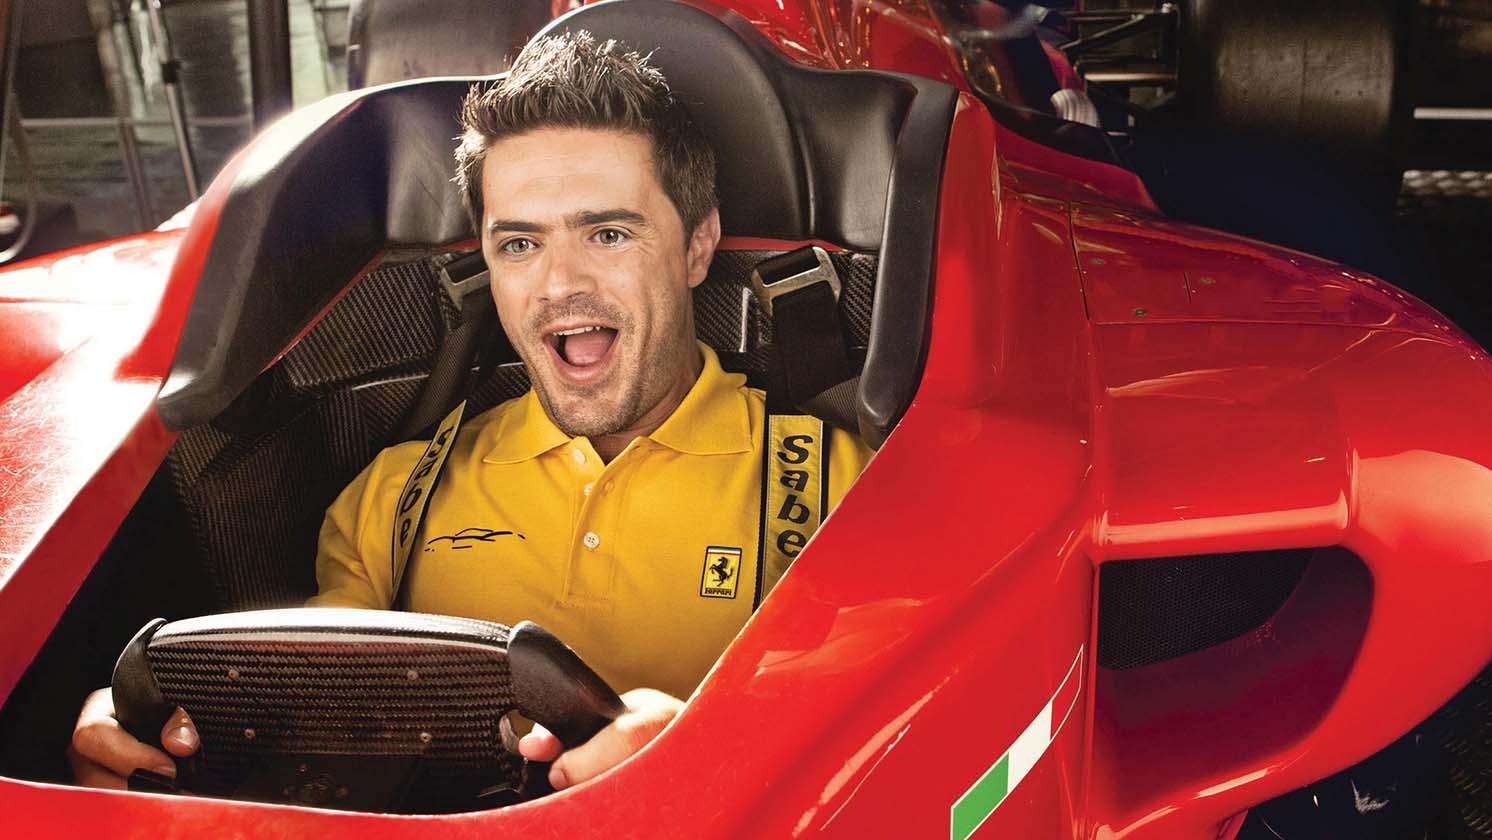 The Most Thrilling Theme Park | Ferrari World Abu Dhabi